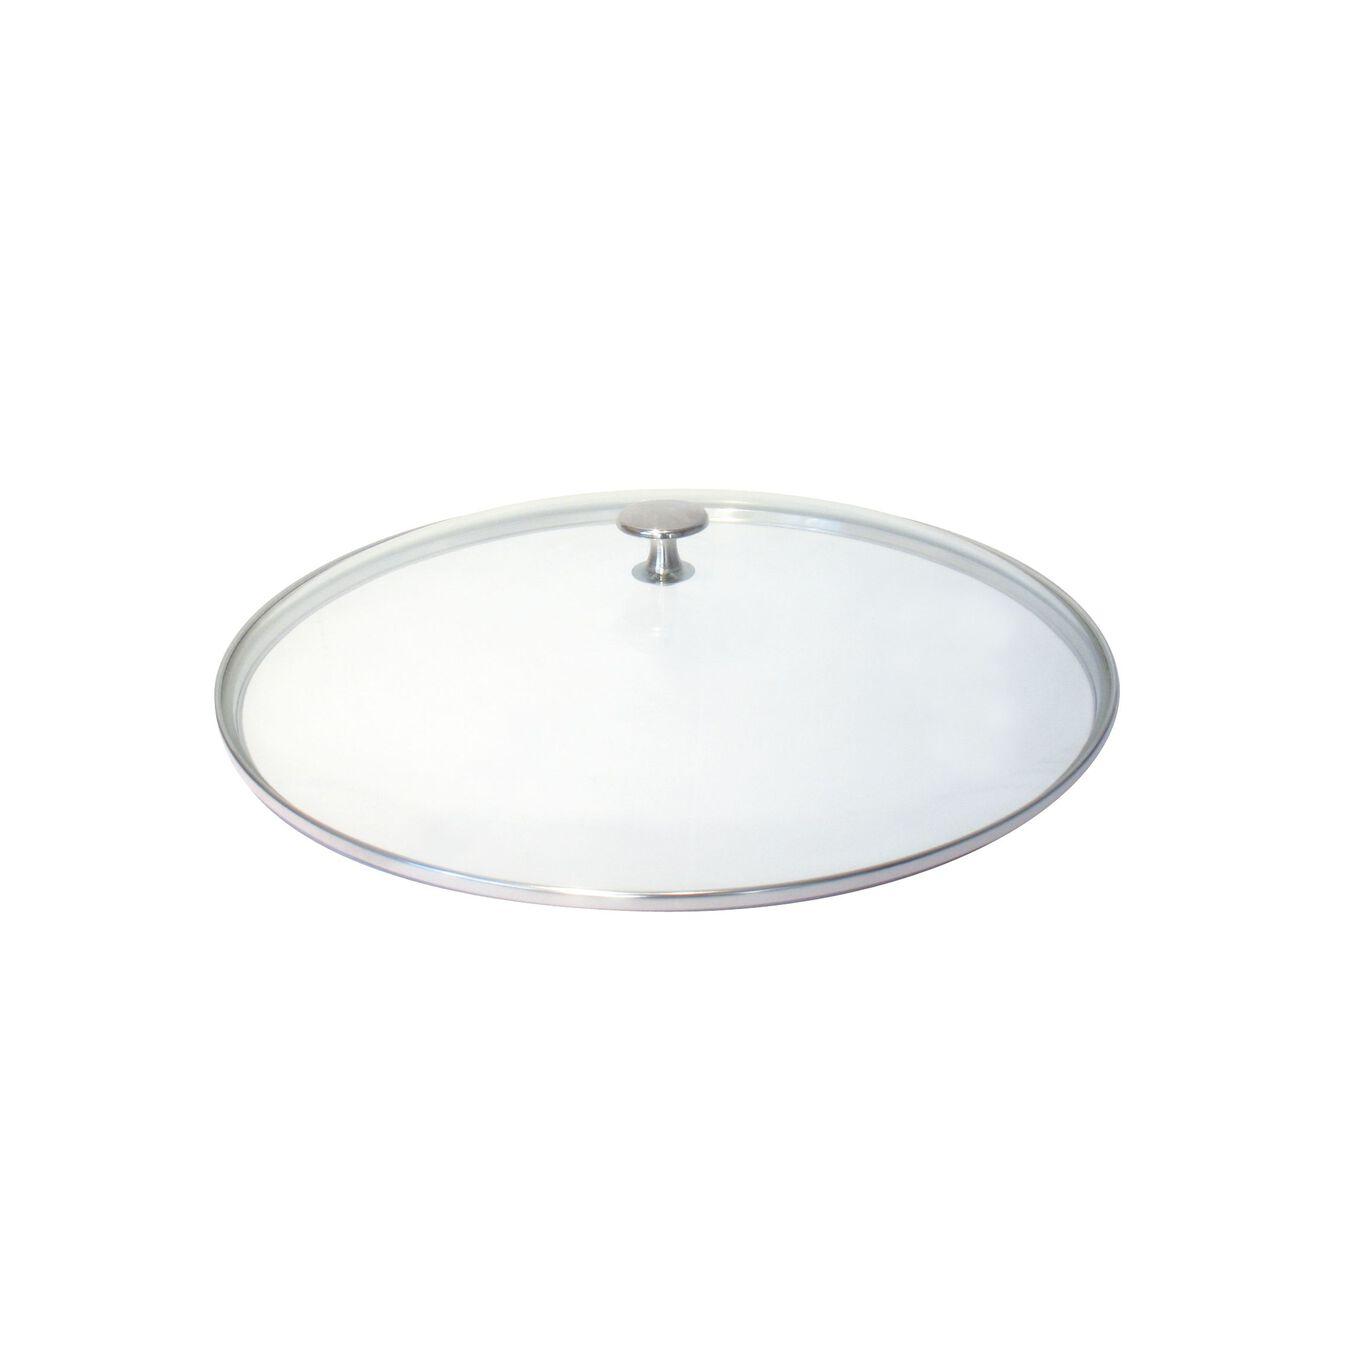 Lock 30 cm, Glas,,large 1